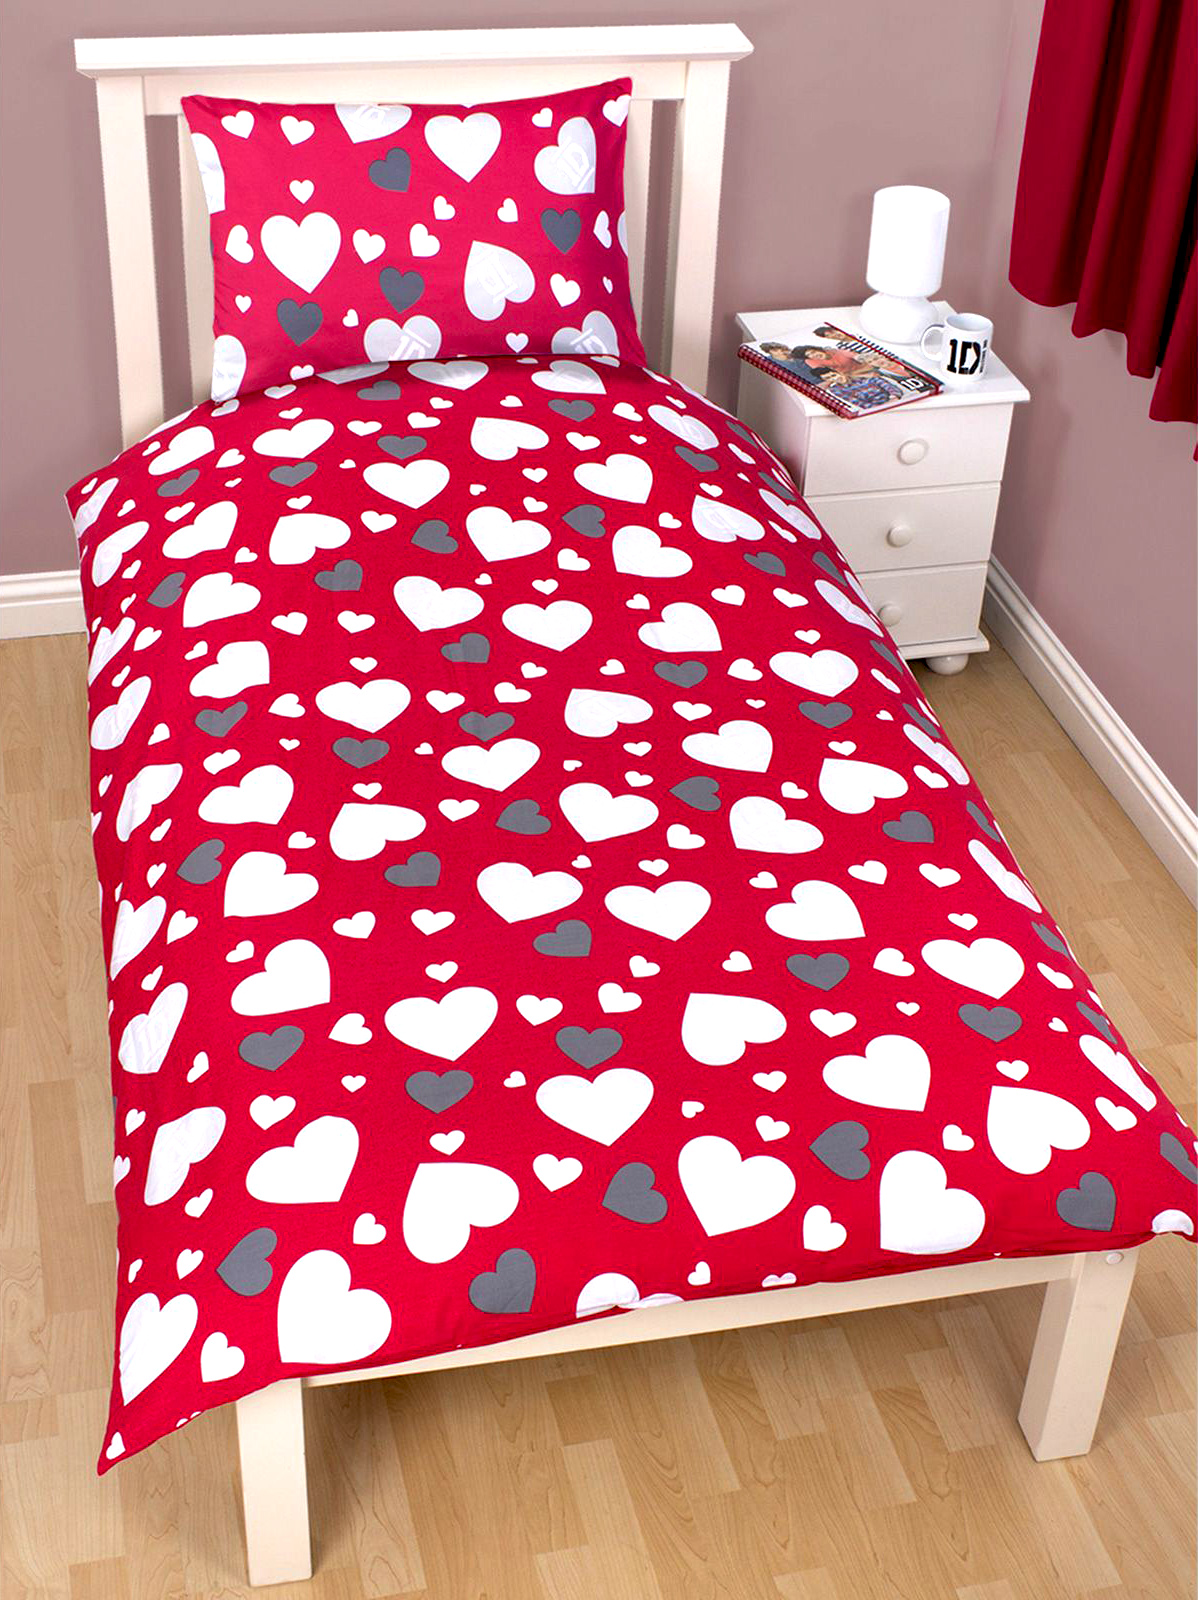 Childrens-Characters-Single-Bed-Quilt-Duvet-Cover-amp-Pillowcase-Kids-Bedding-Set thumbnail 160